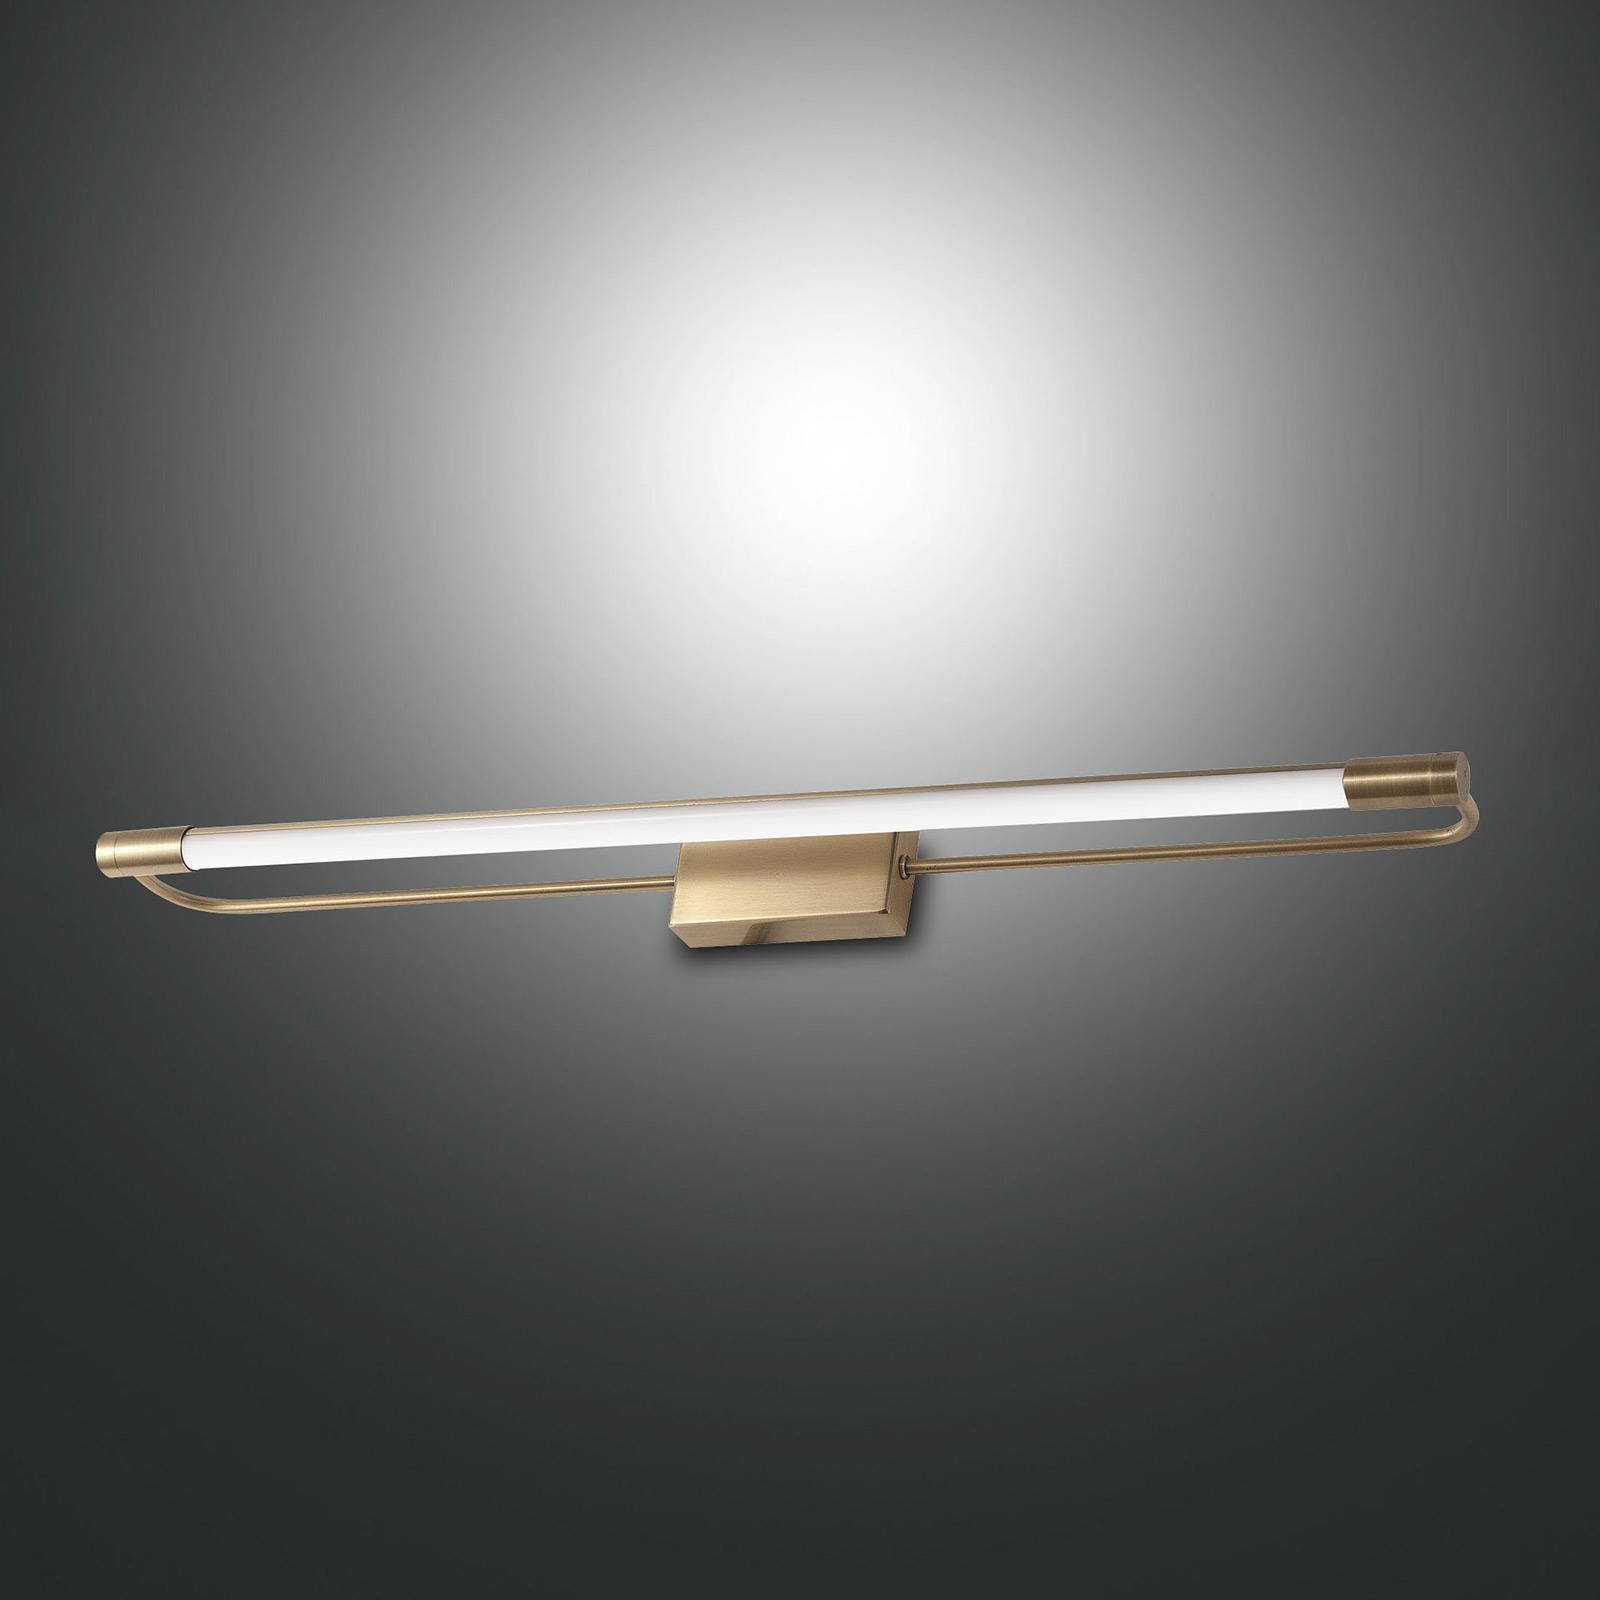 LED-vegglampe Rapallo, messing, IP44, 60 cm